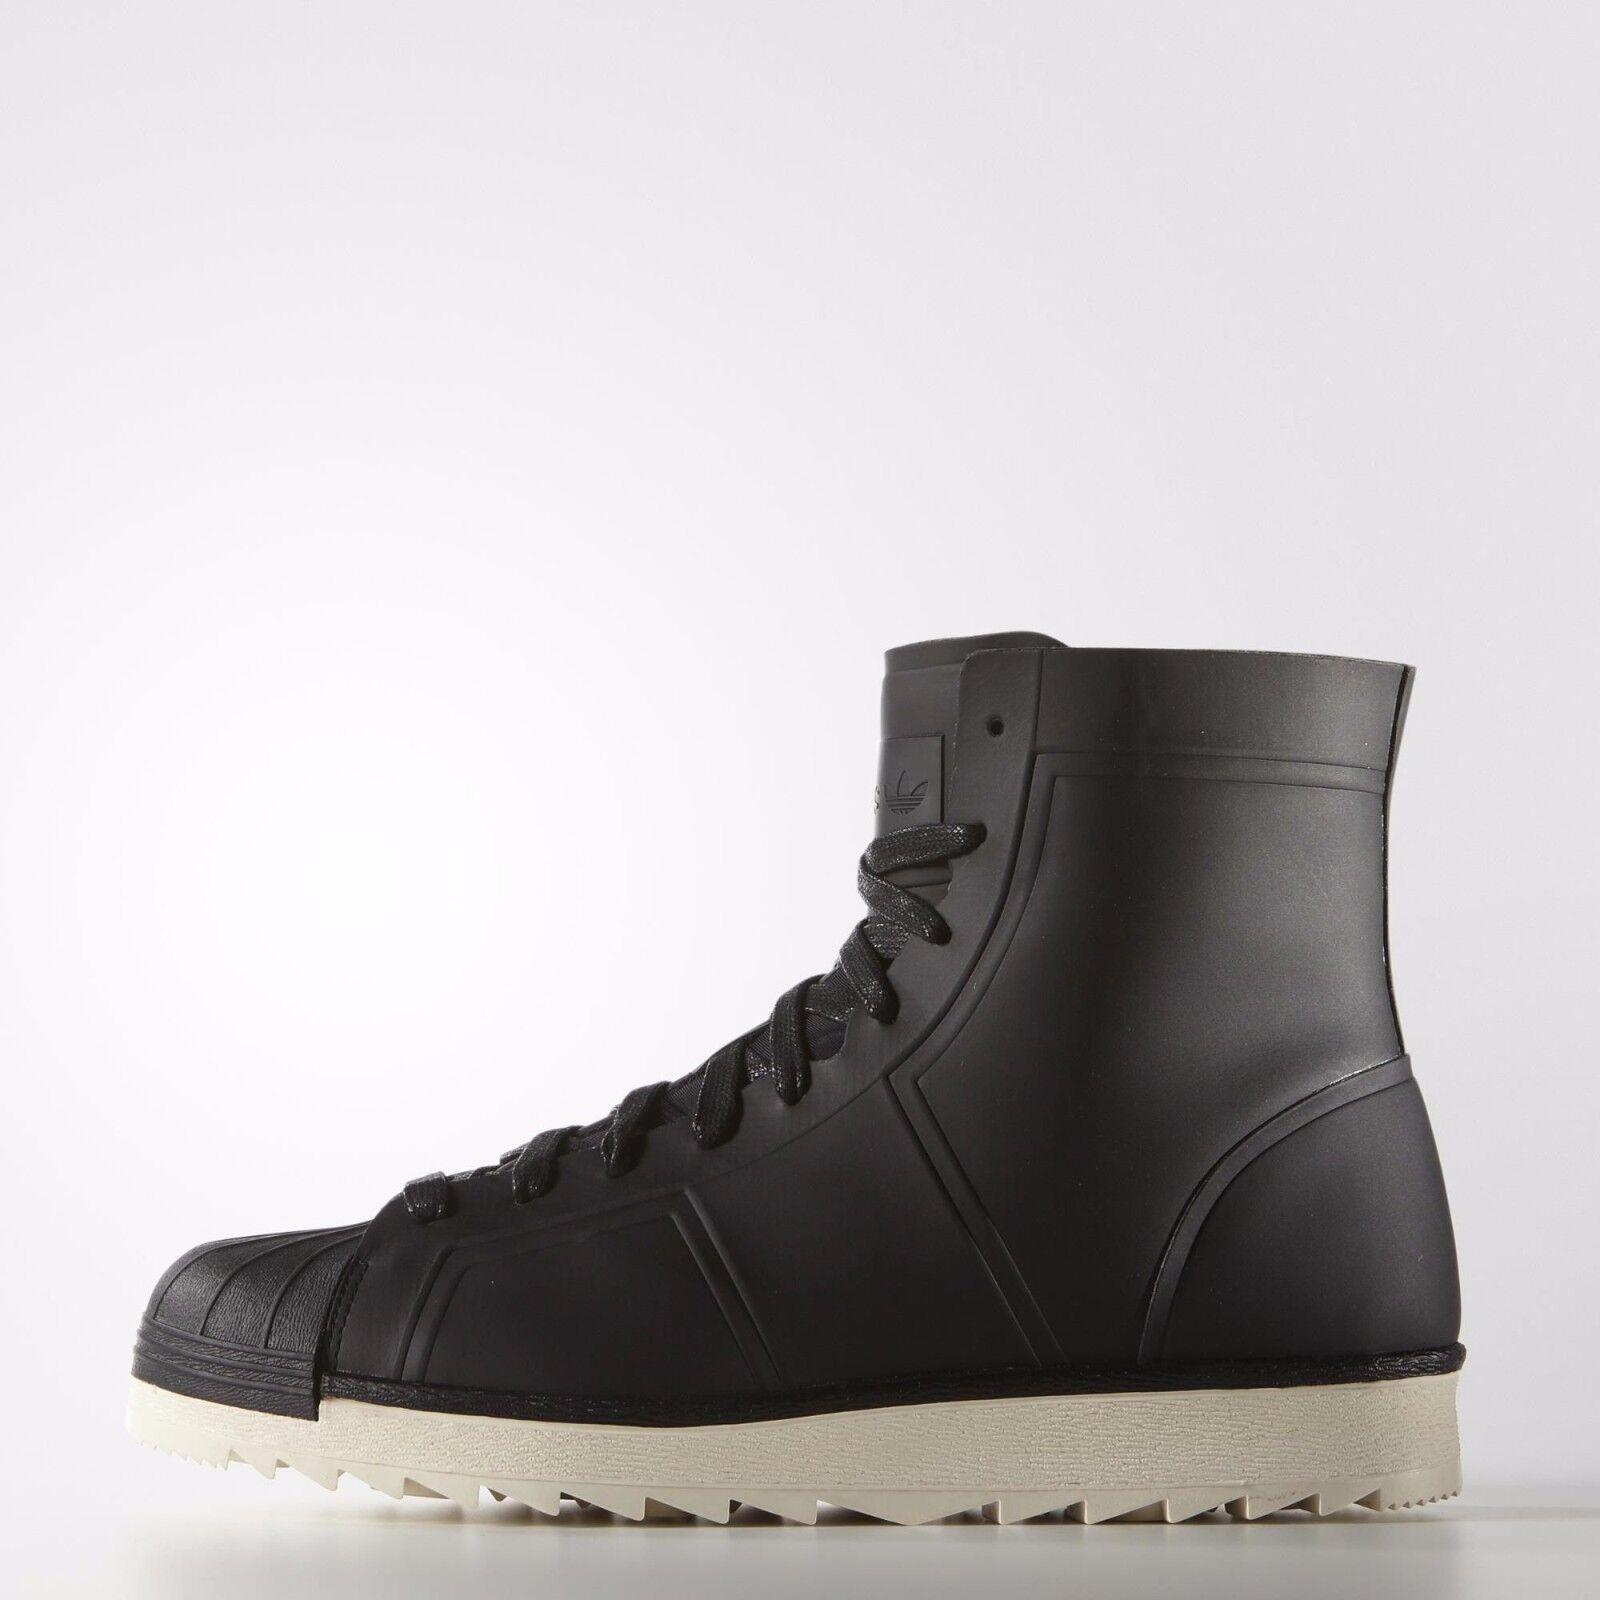 Adidas Originals Superstar Jungle Waterproof Shoes B35231